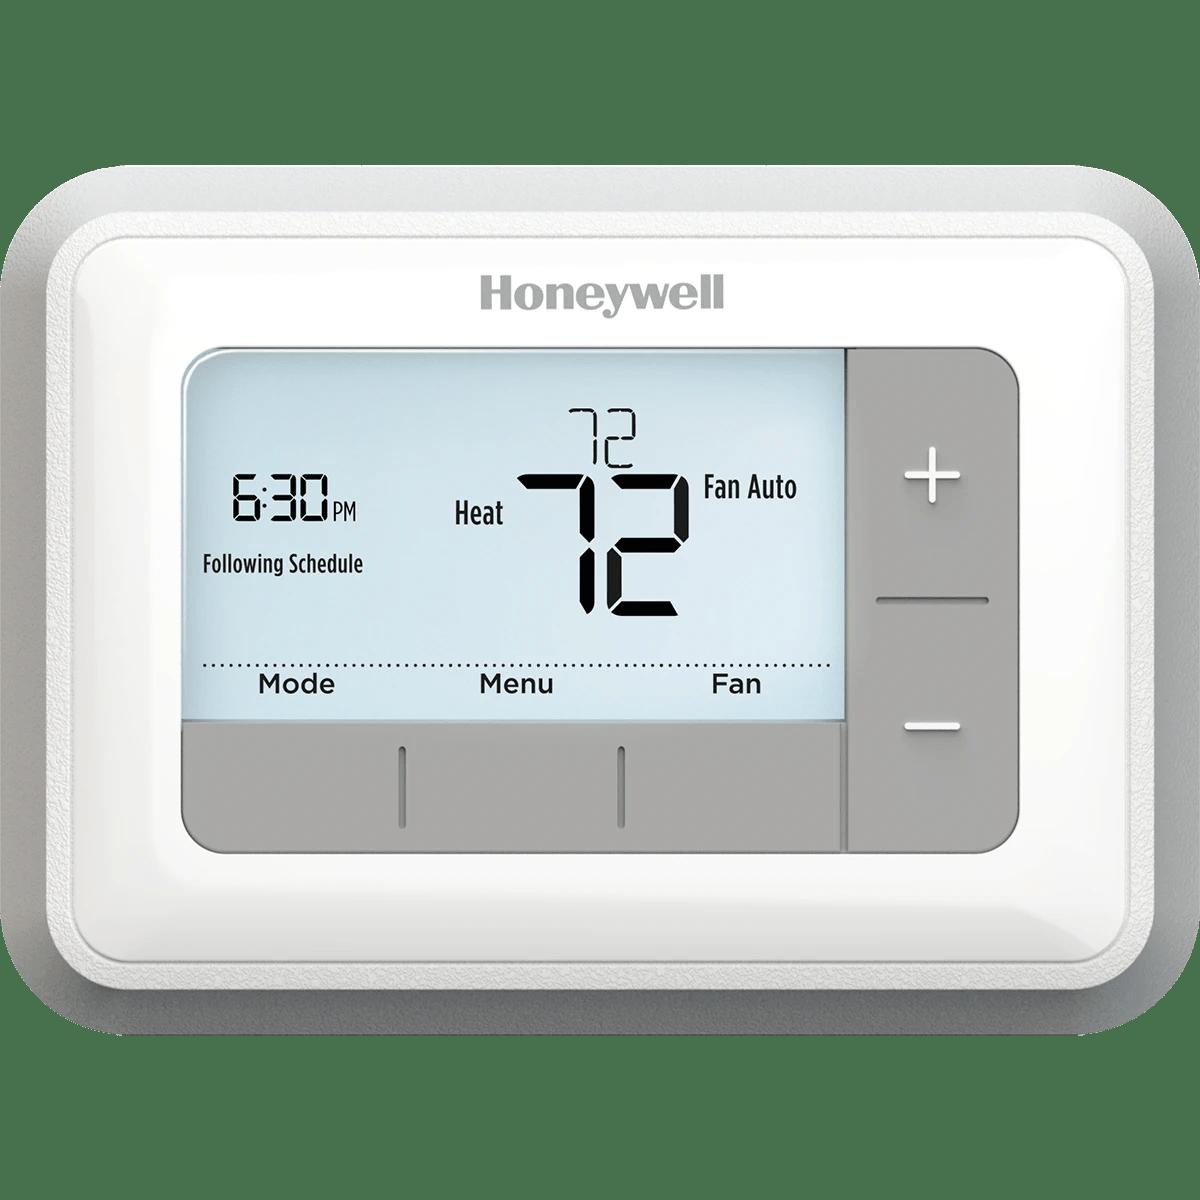 hight resolution of  honeywell rth7560e 7 day programmable thermostat main honeywell t5 7 day programmable thermostat sylvane honeywell thermostat